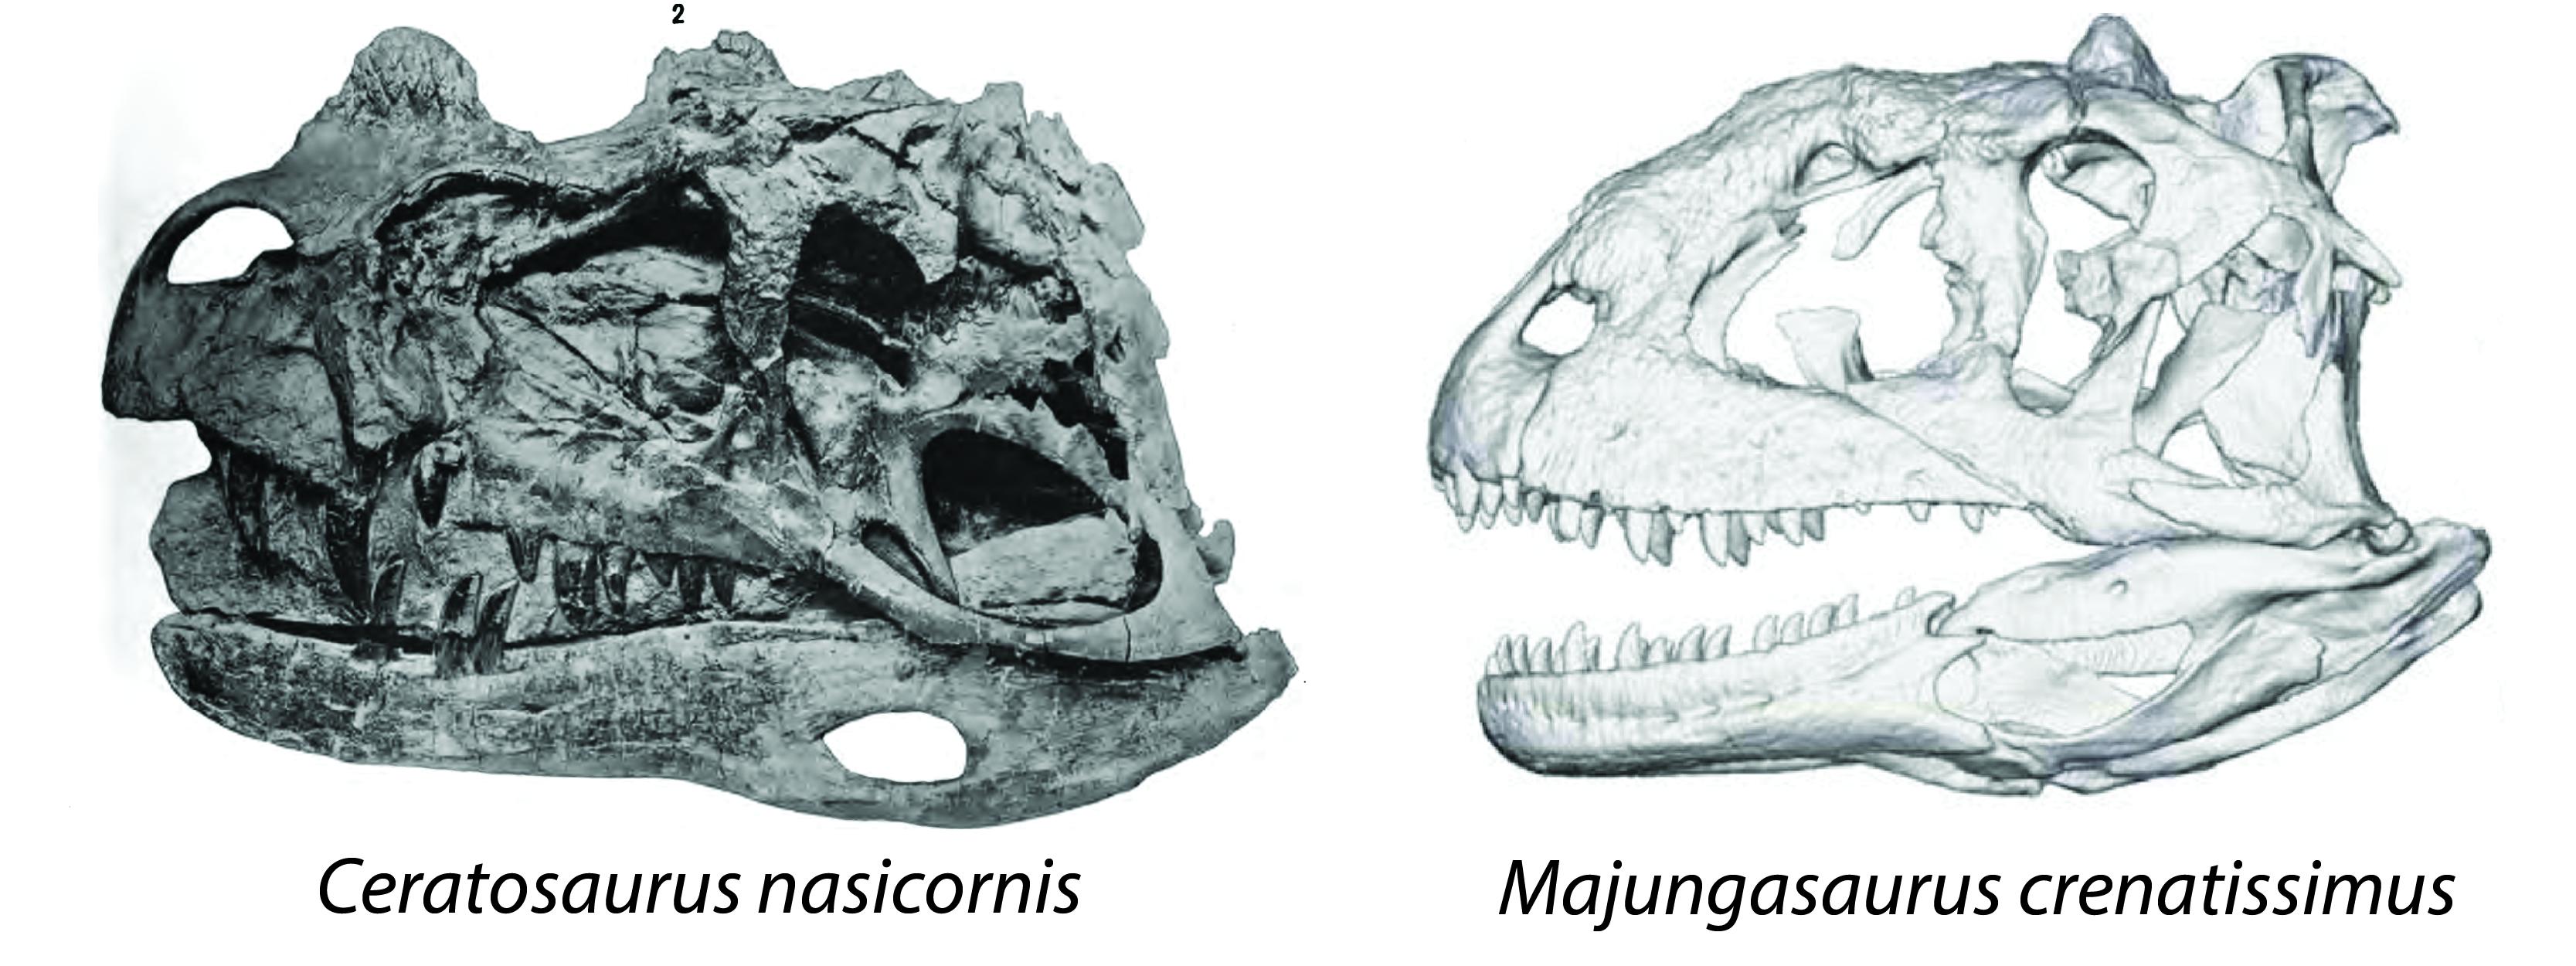 Episode 25 – Ceratosaurs: Story of a Predatory Dinosaur Dynasty!